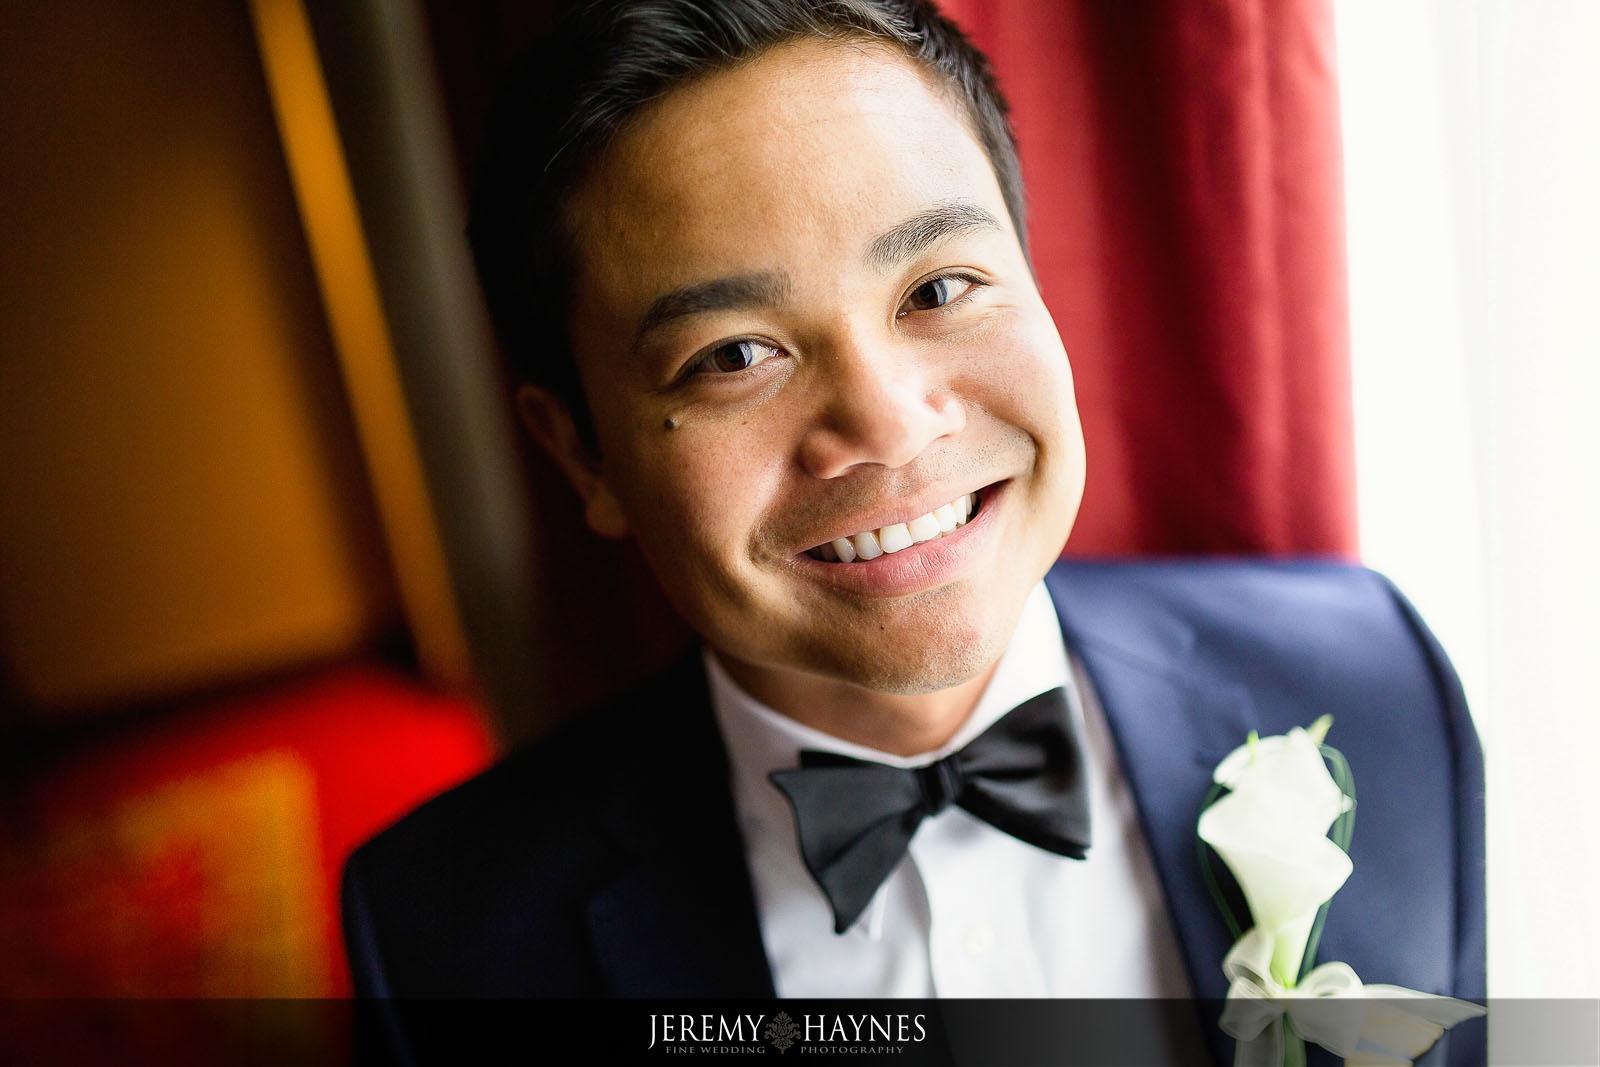 colorful-groom-getting-ready-photos-renaissance-hotel-carmel